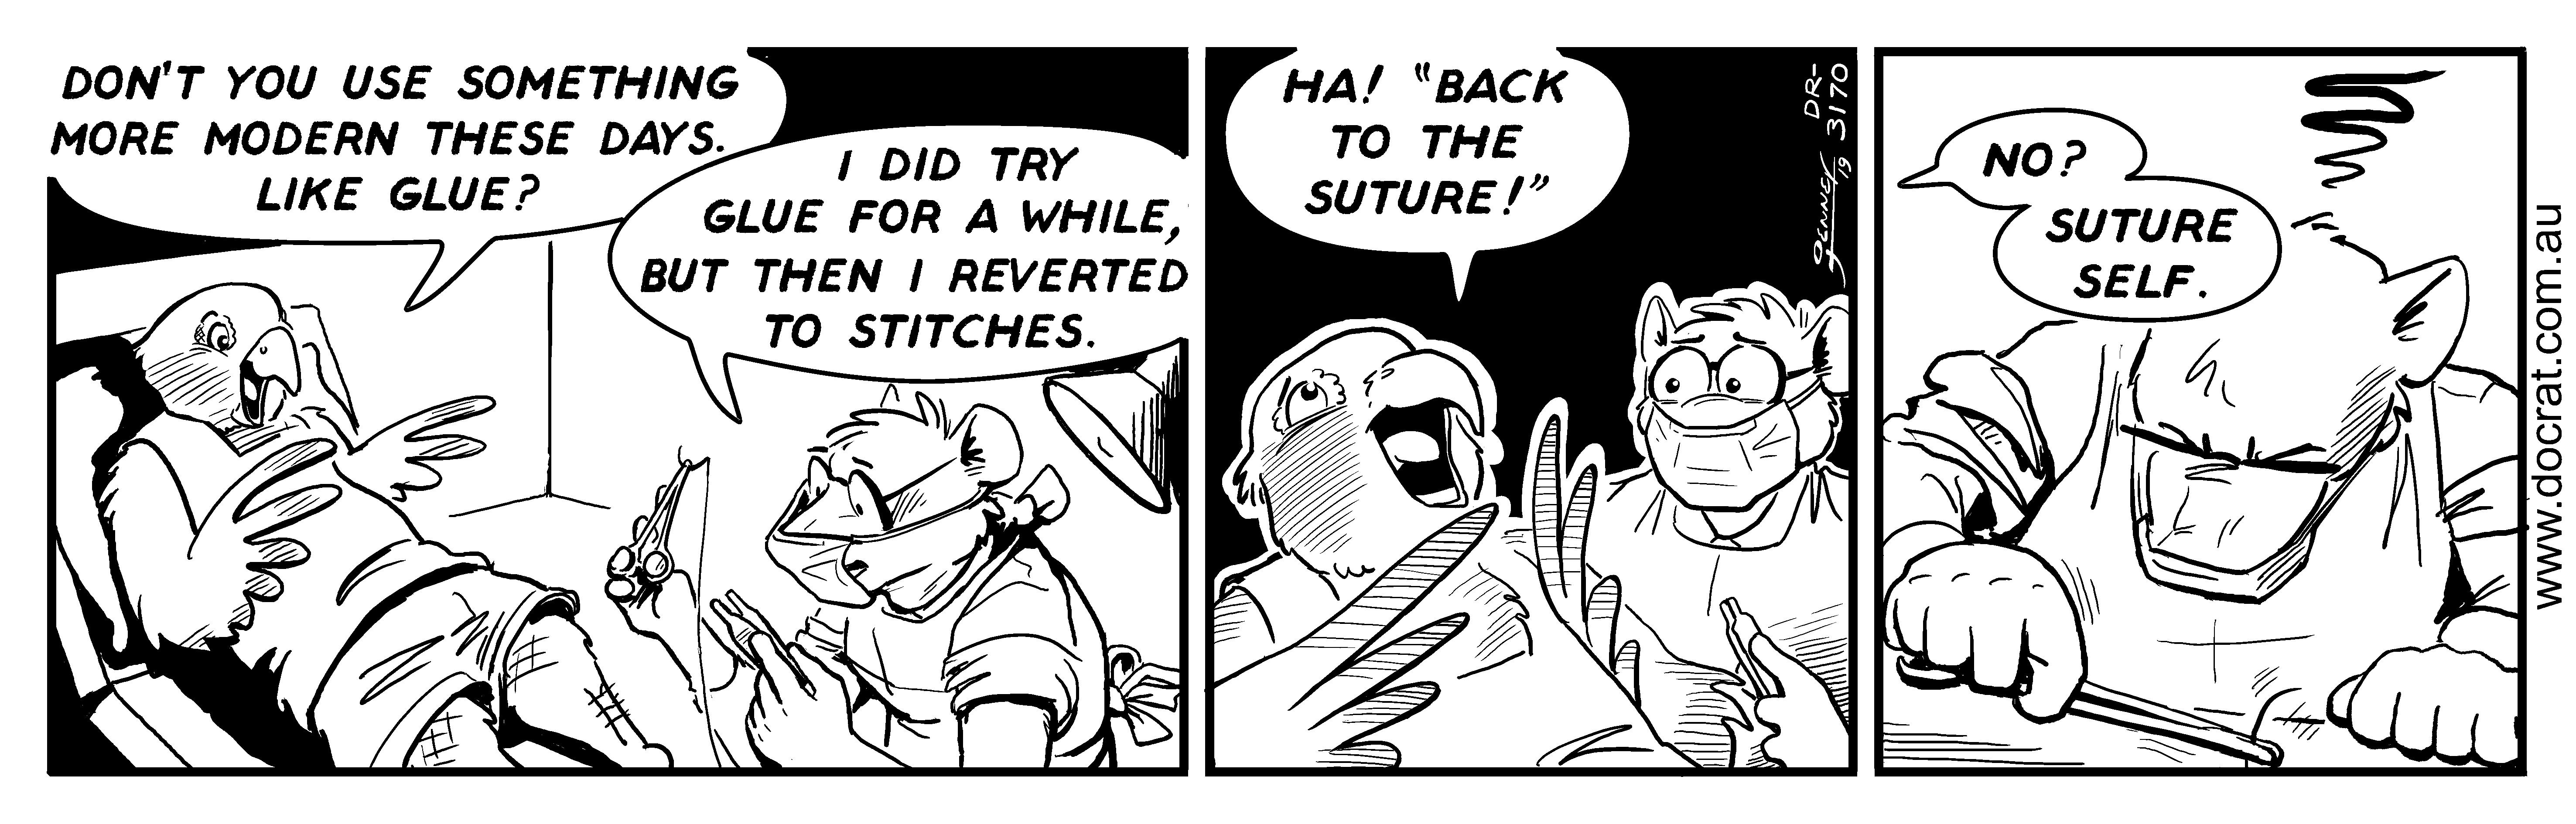 20190201